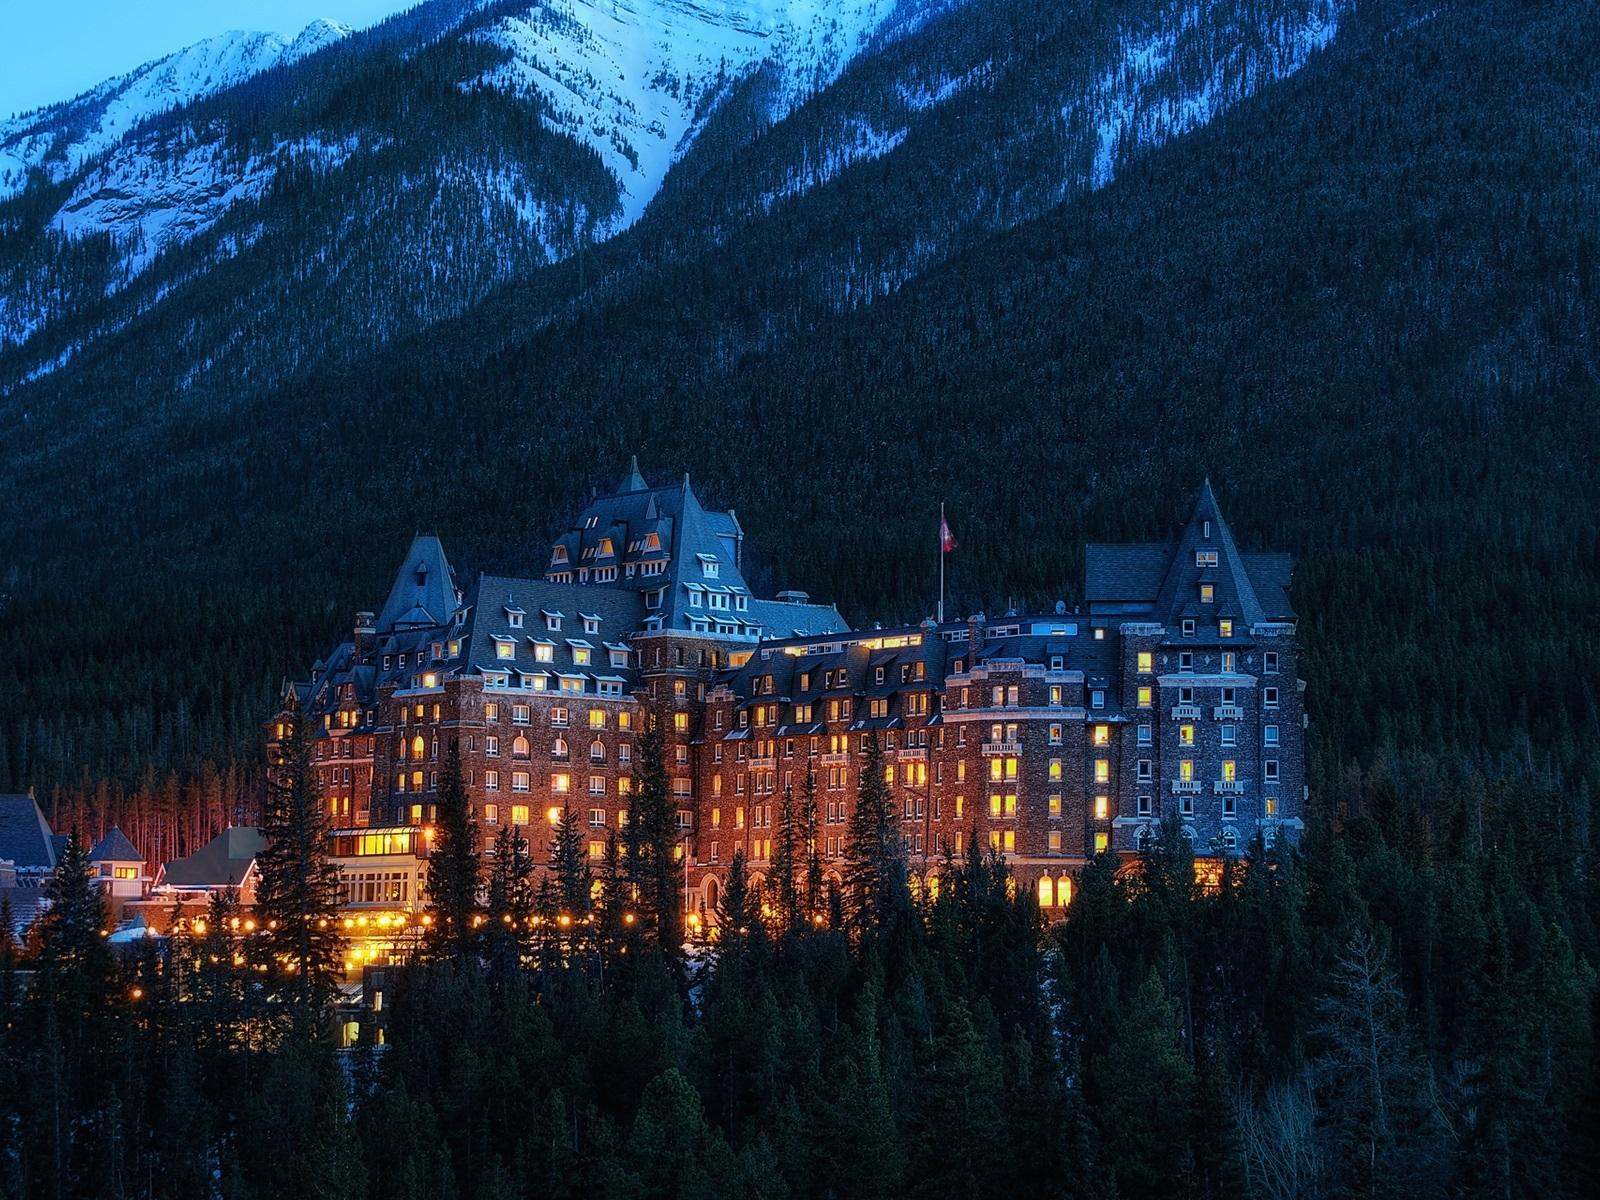 Hintergrundbilder Beschreibung Alberta Banff Nationalpark Kanada